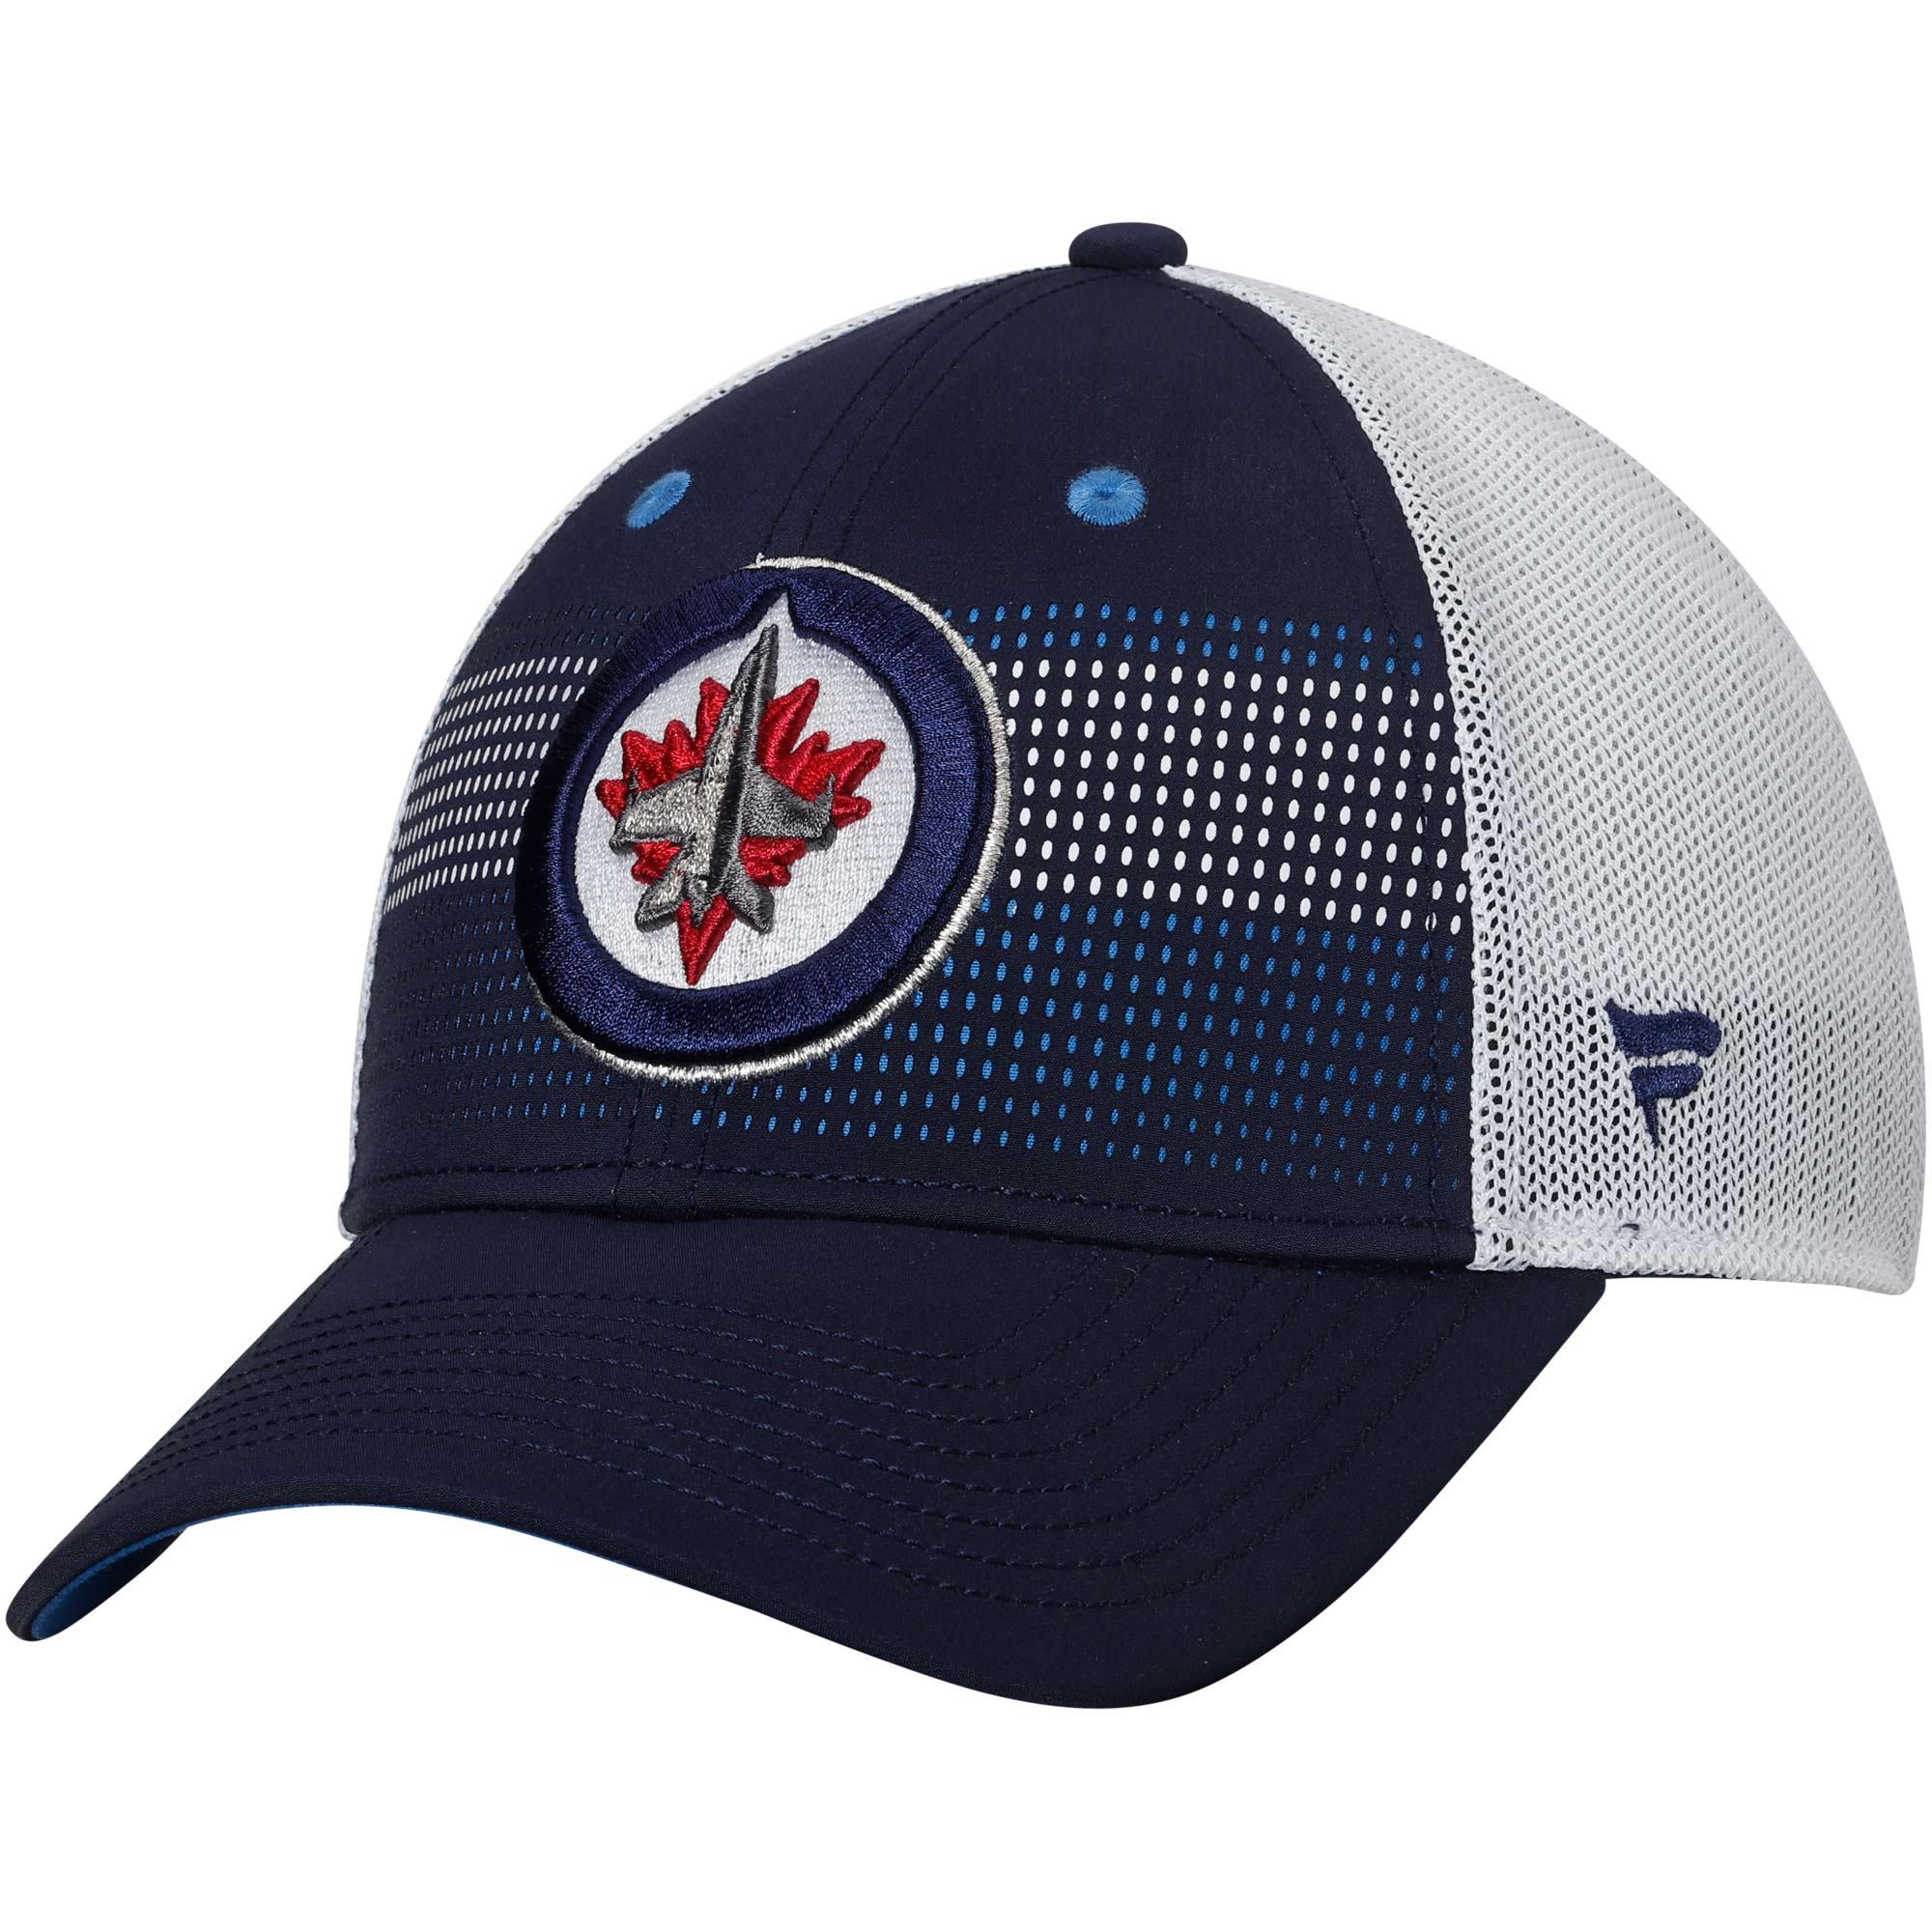 Winnipeg Jets Fanatics Branded Iconic Grid Trucker Adjustable Hat - Navy/White - OSFA